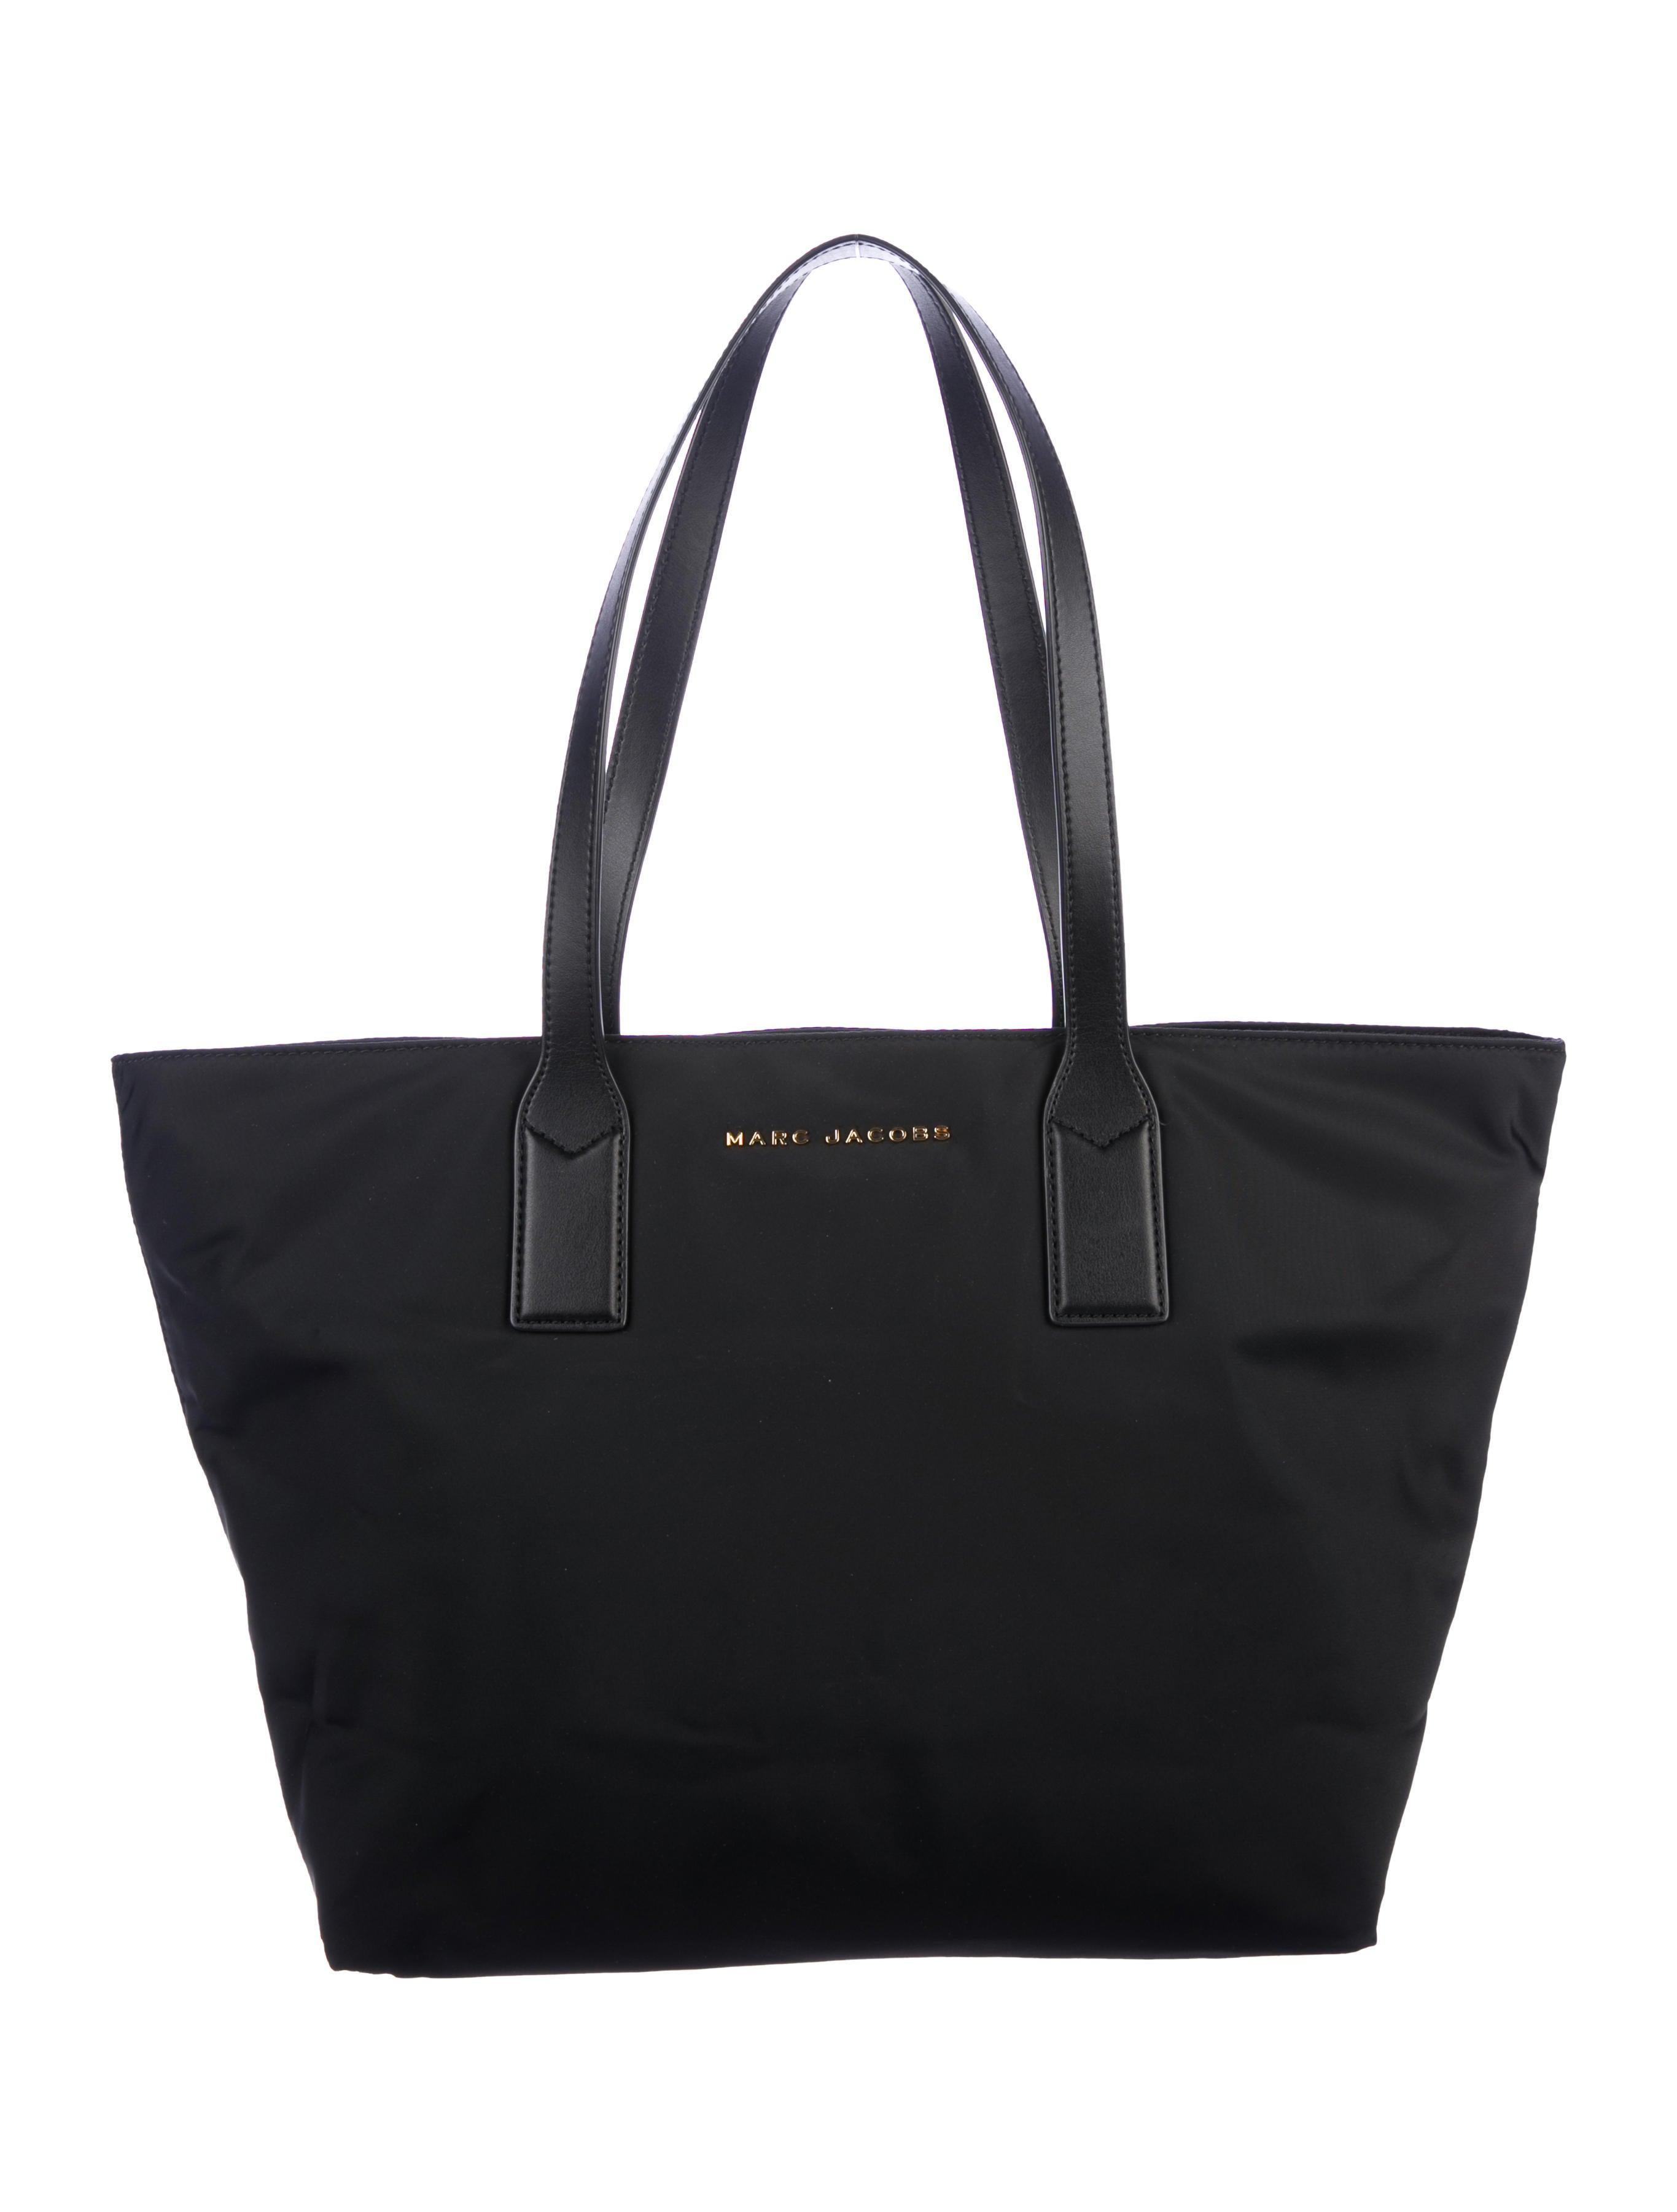 9a5e583ac254 Marc Jacobs Nylon Wingman Tote Bag - Handbags - MAR67760